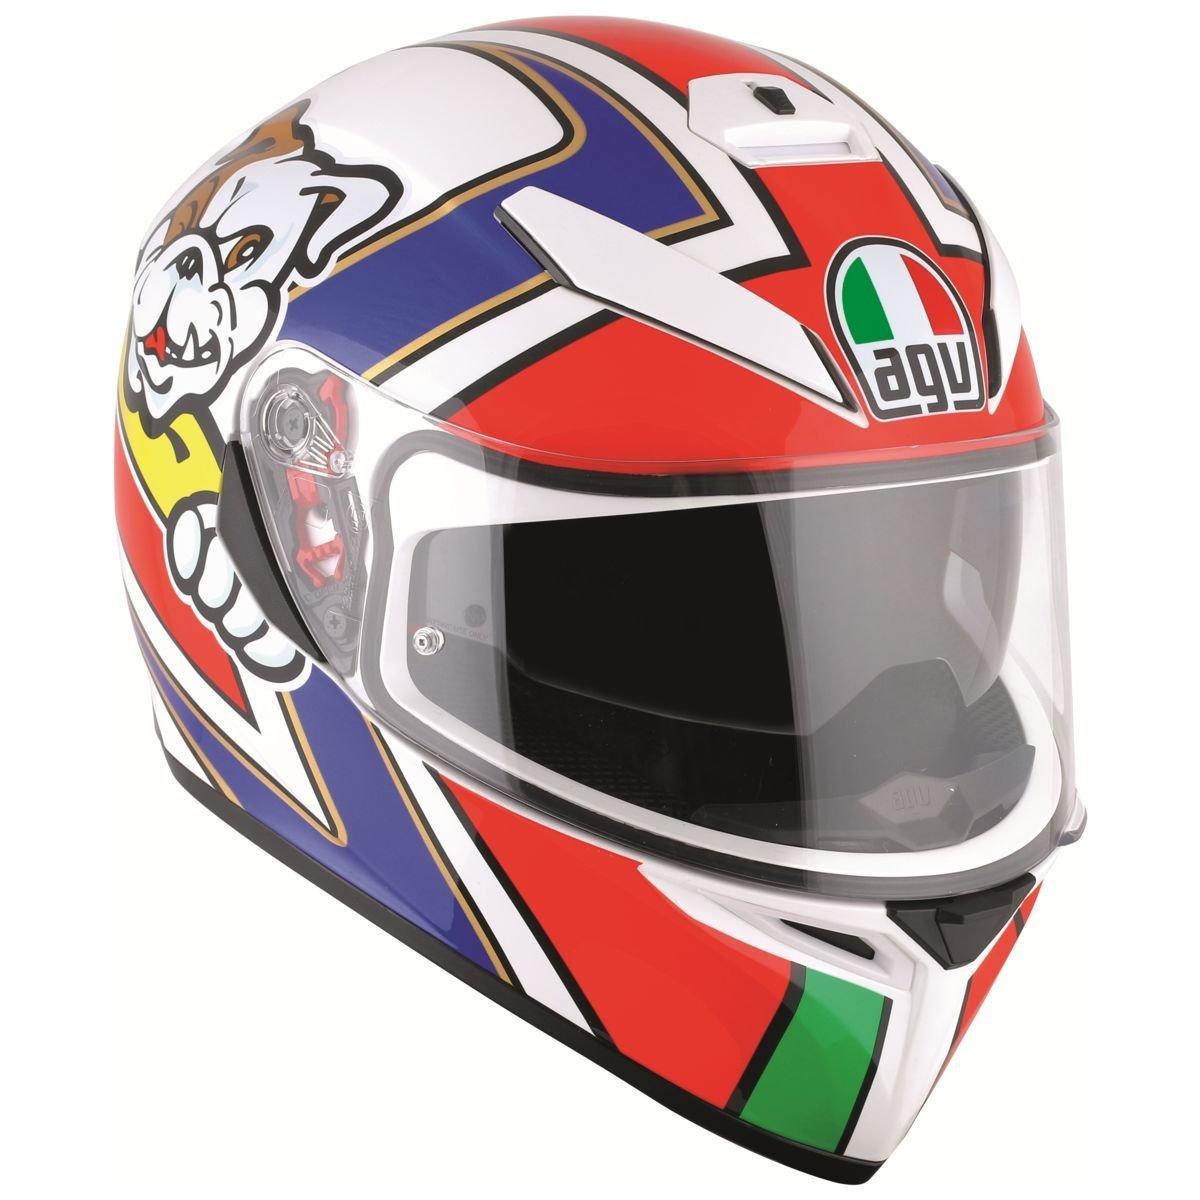 AGV K3 SV Helmet - Camodaz   Motorcycle Helmets   Bike Stop UK